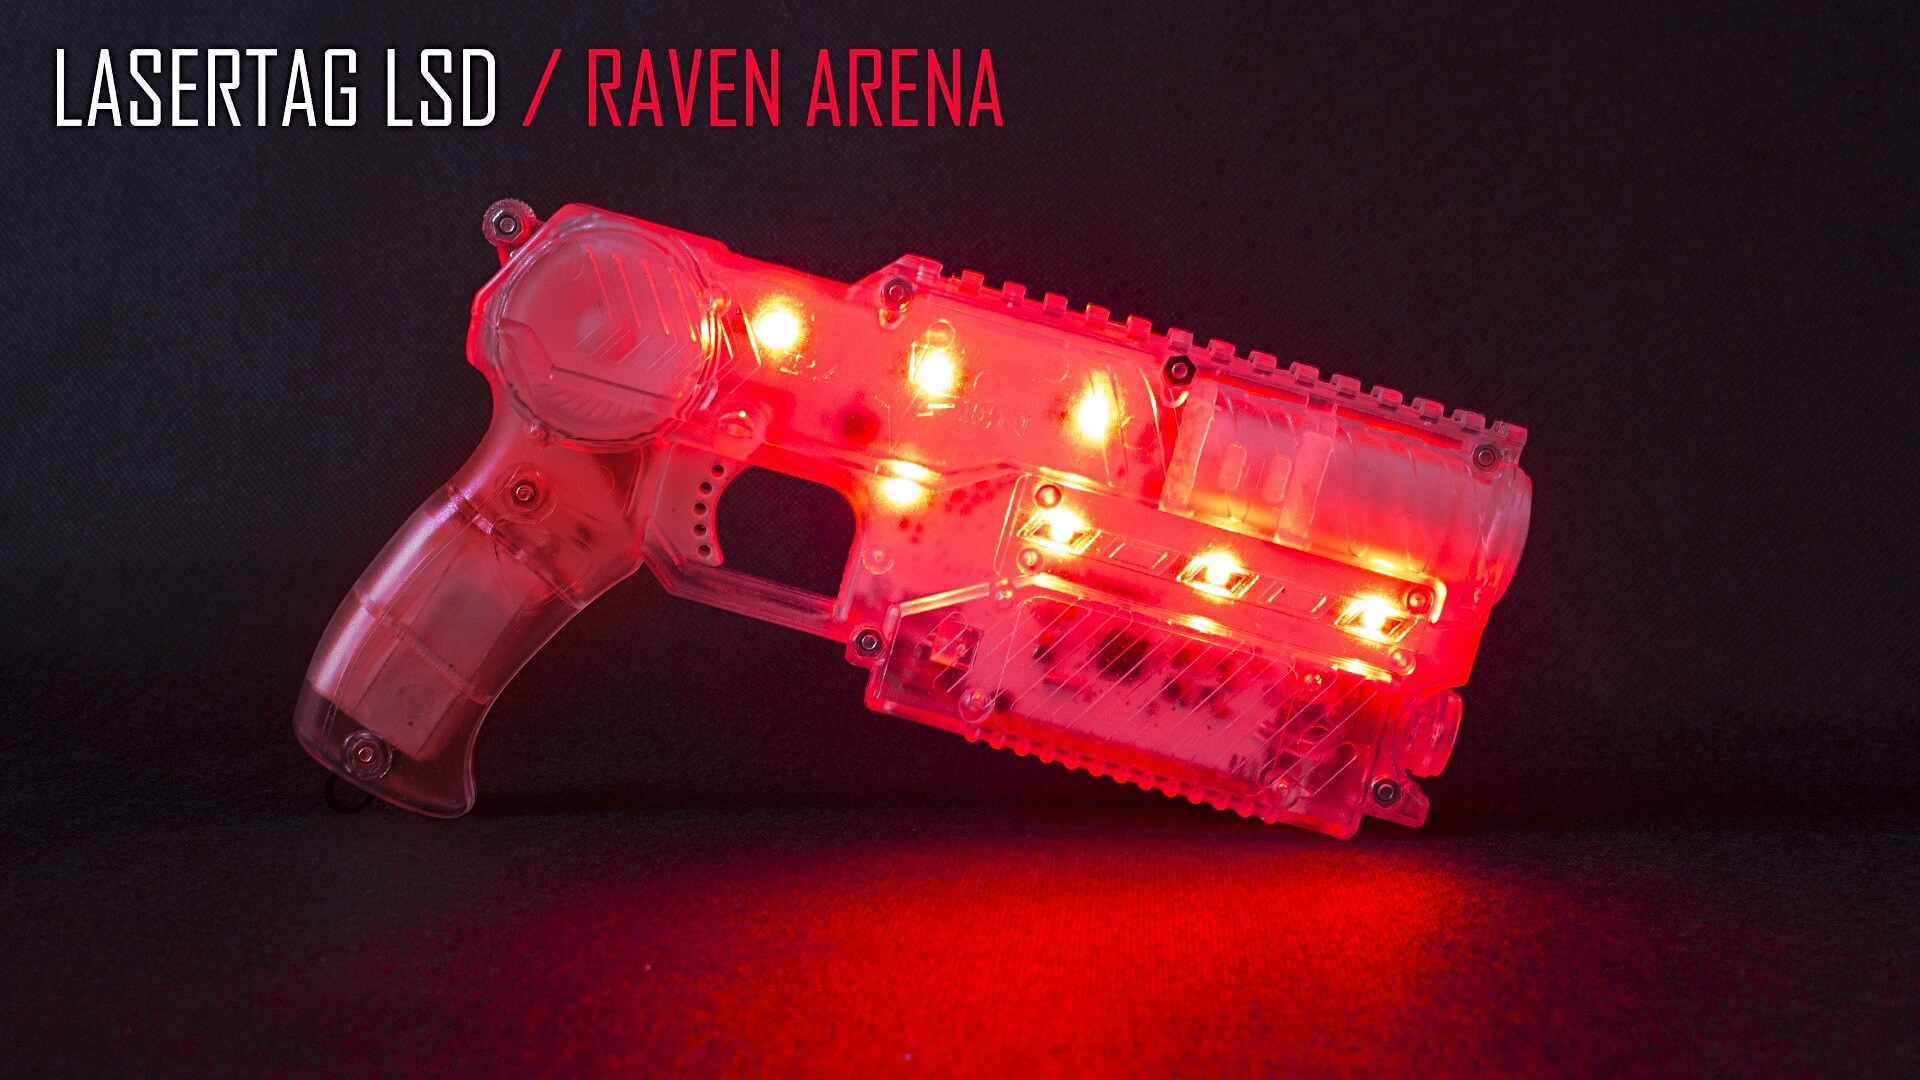 Raven Arena